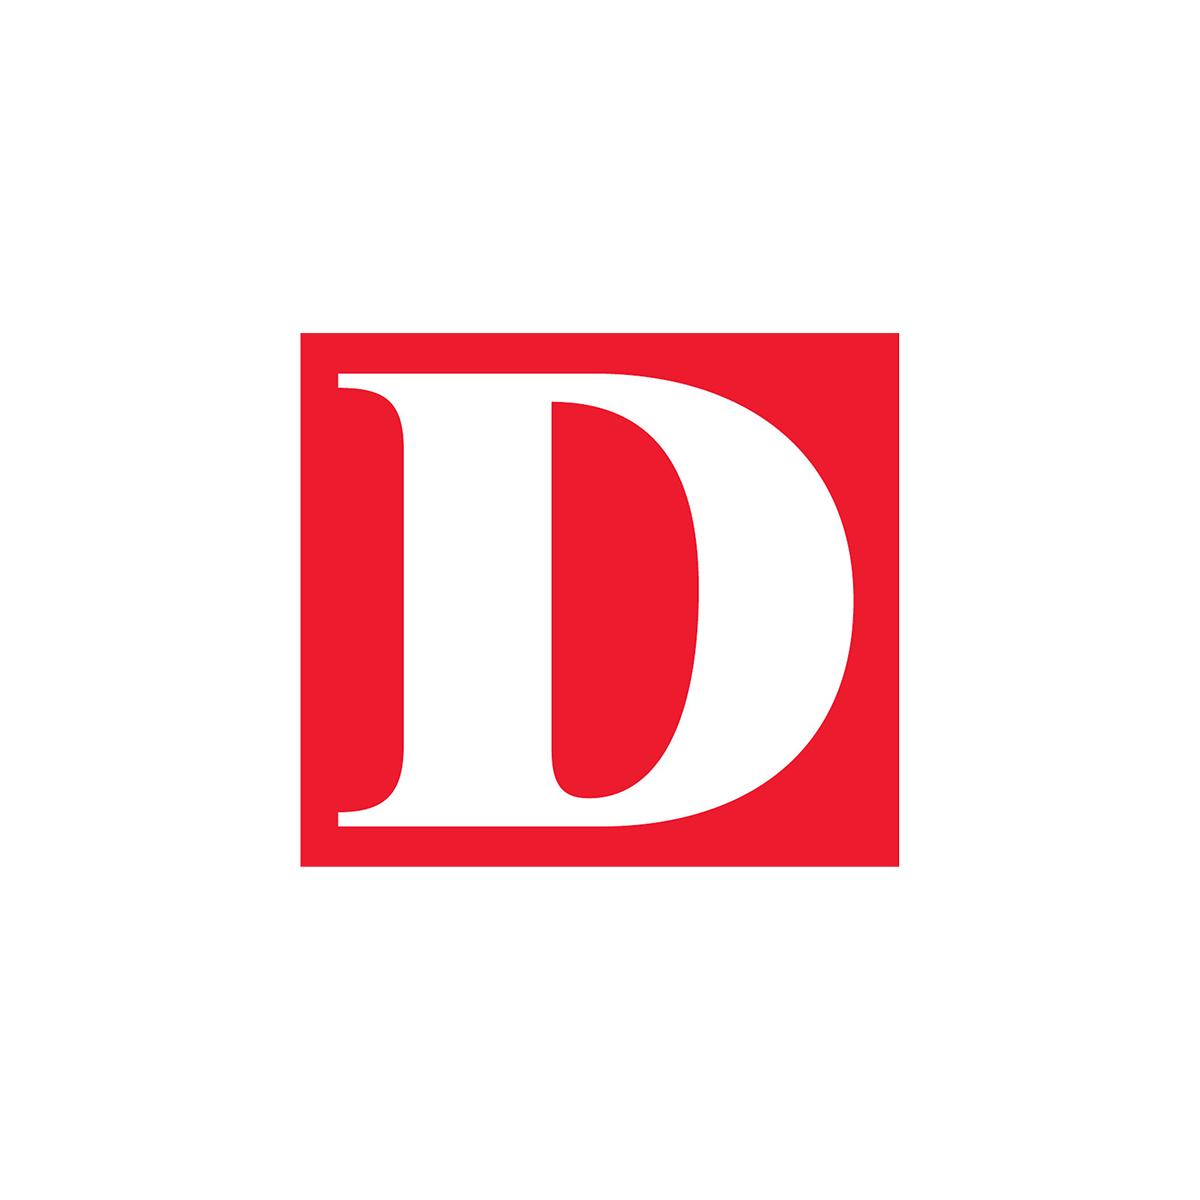 D (site logo).png